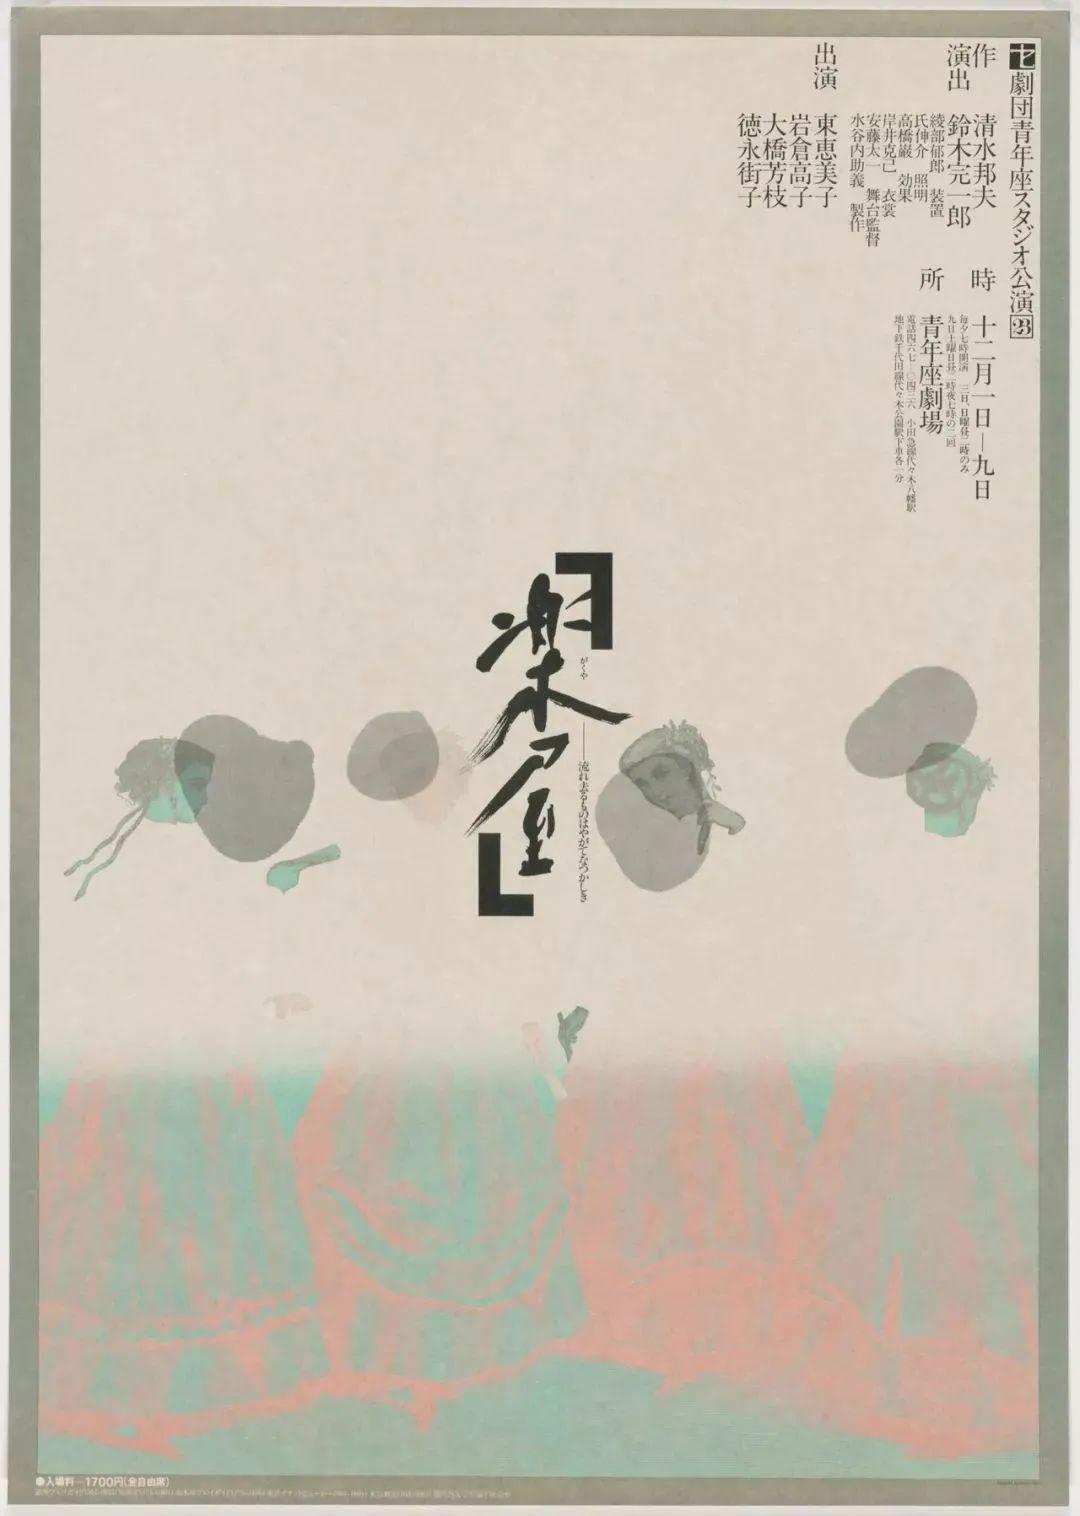 佐藤晃一Koichi Sato. Gakuya. 1983